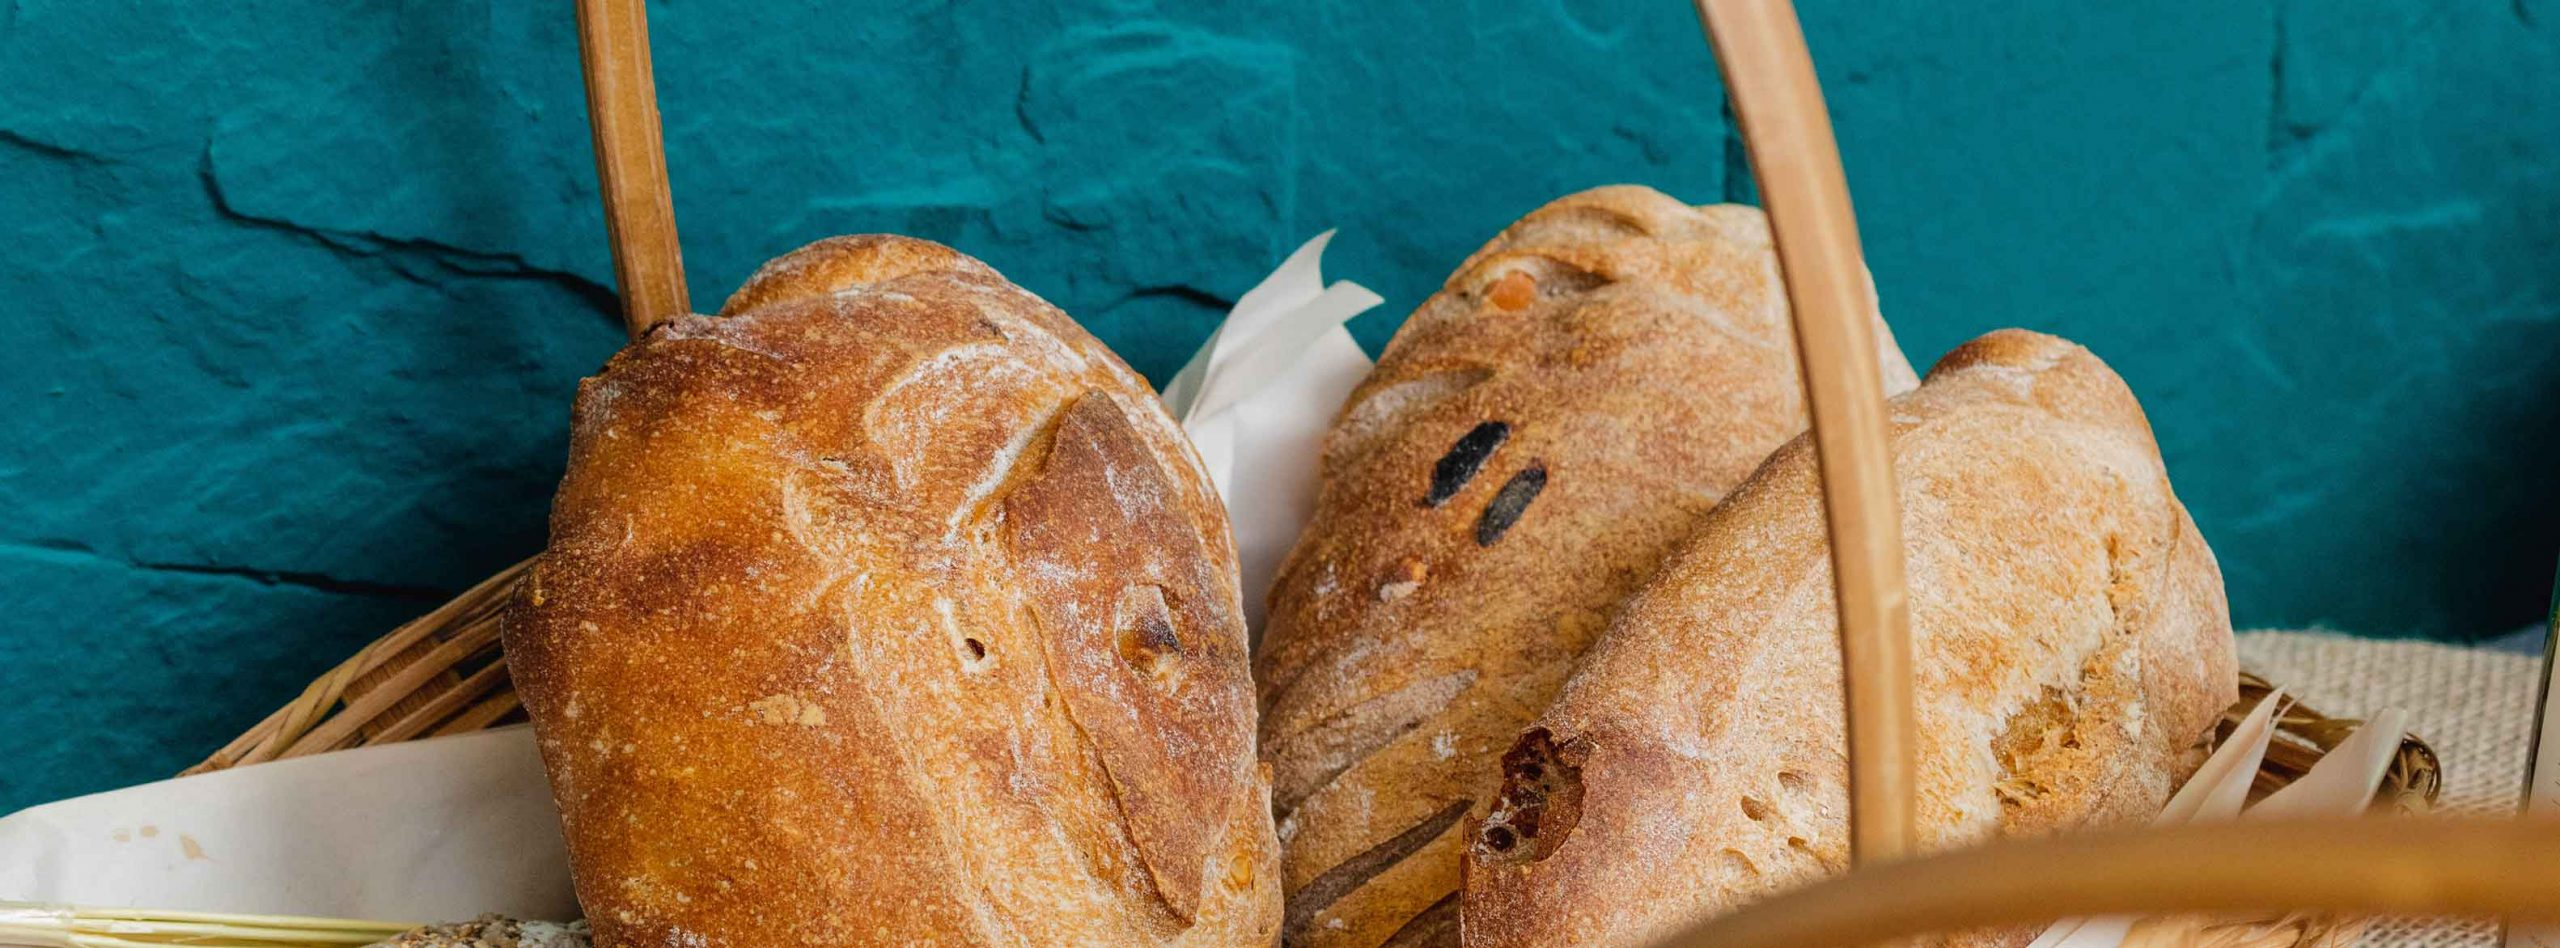 bakery-process-3